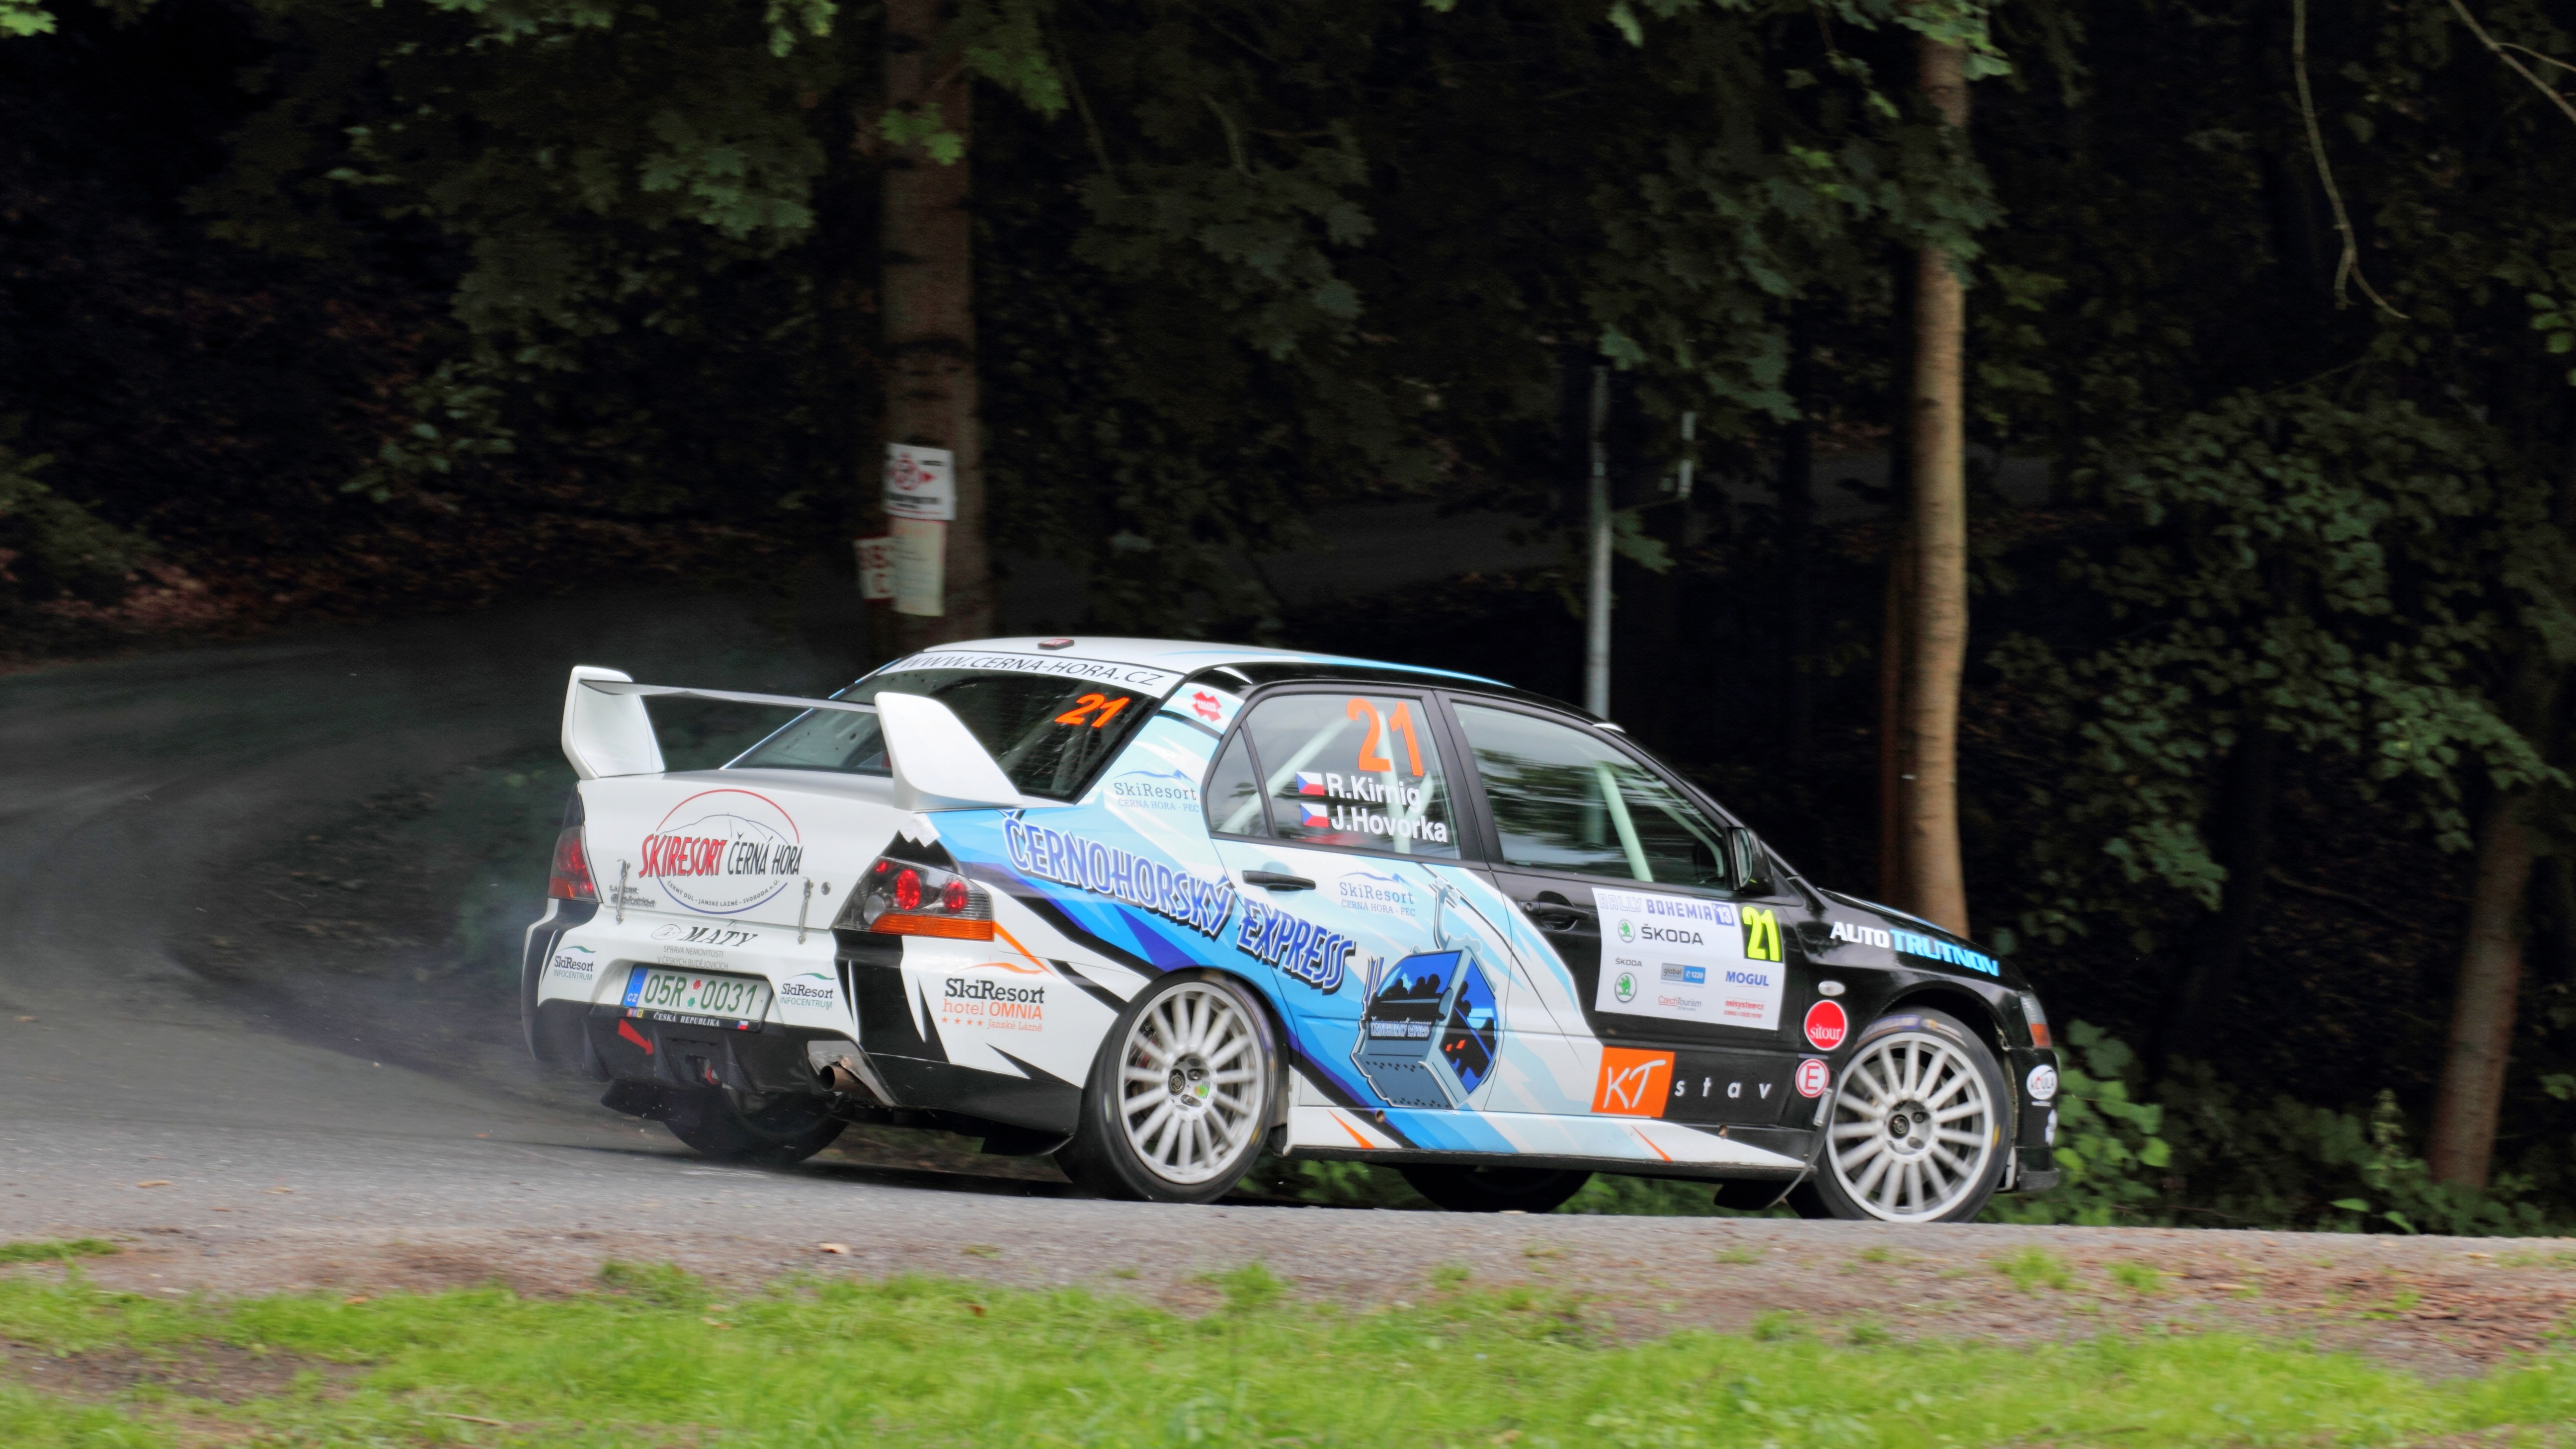 File:Rally Bohemia 2013 - Kirnig, Mitsubishi Lancer Evo IX.JPG - Wikimedia Commons